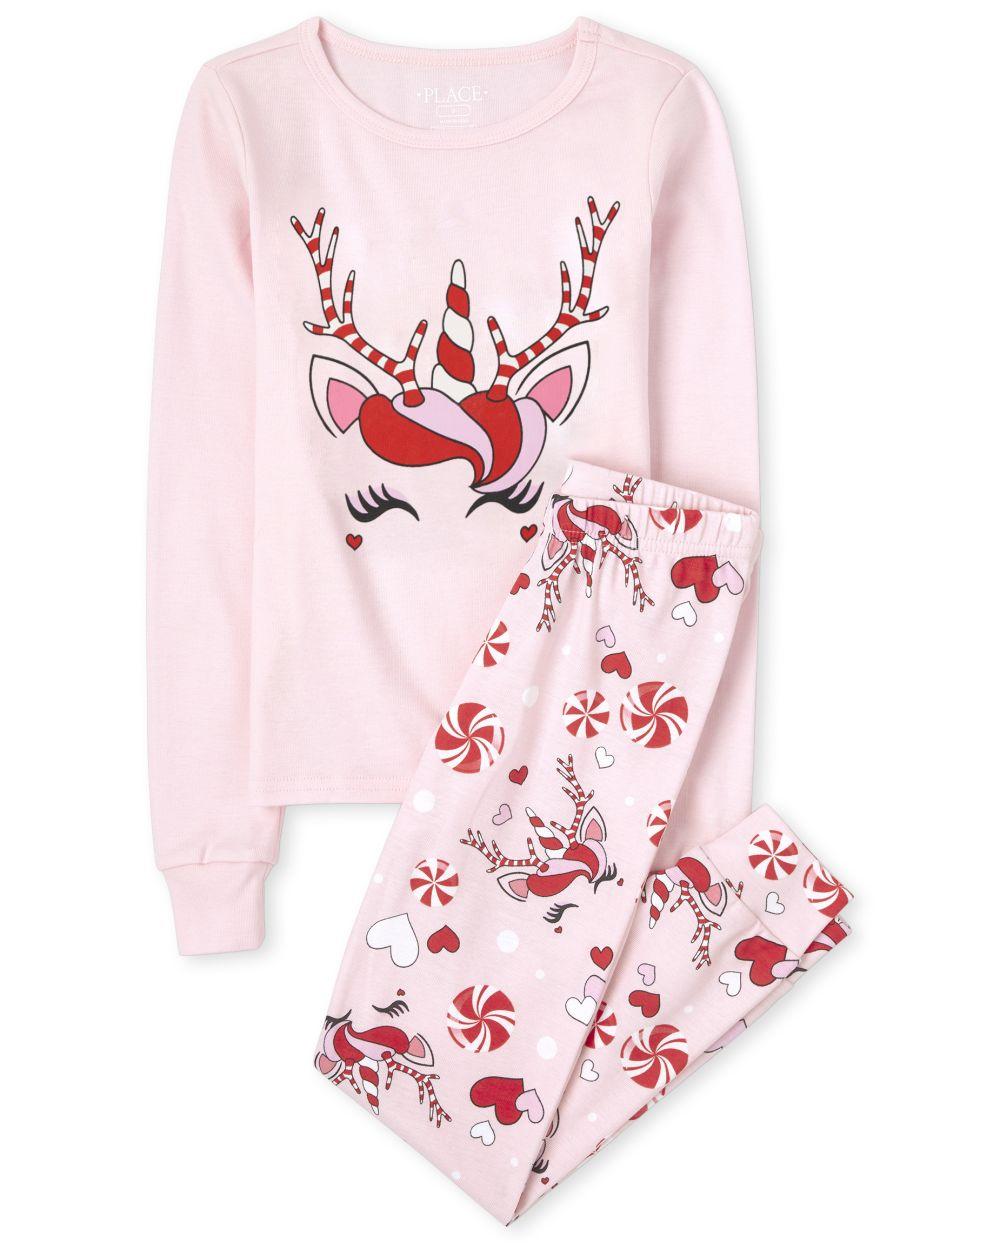 Girls Mommy And Me Christmas Unicorn Snug Fit Cotton Matching Pajamas